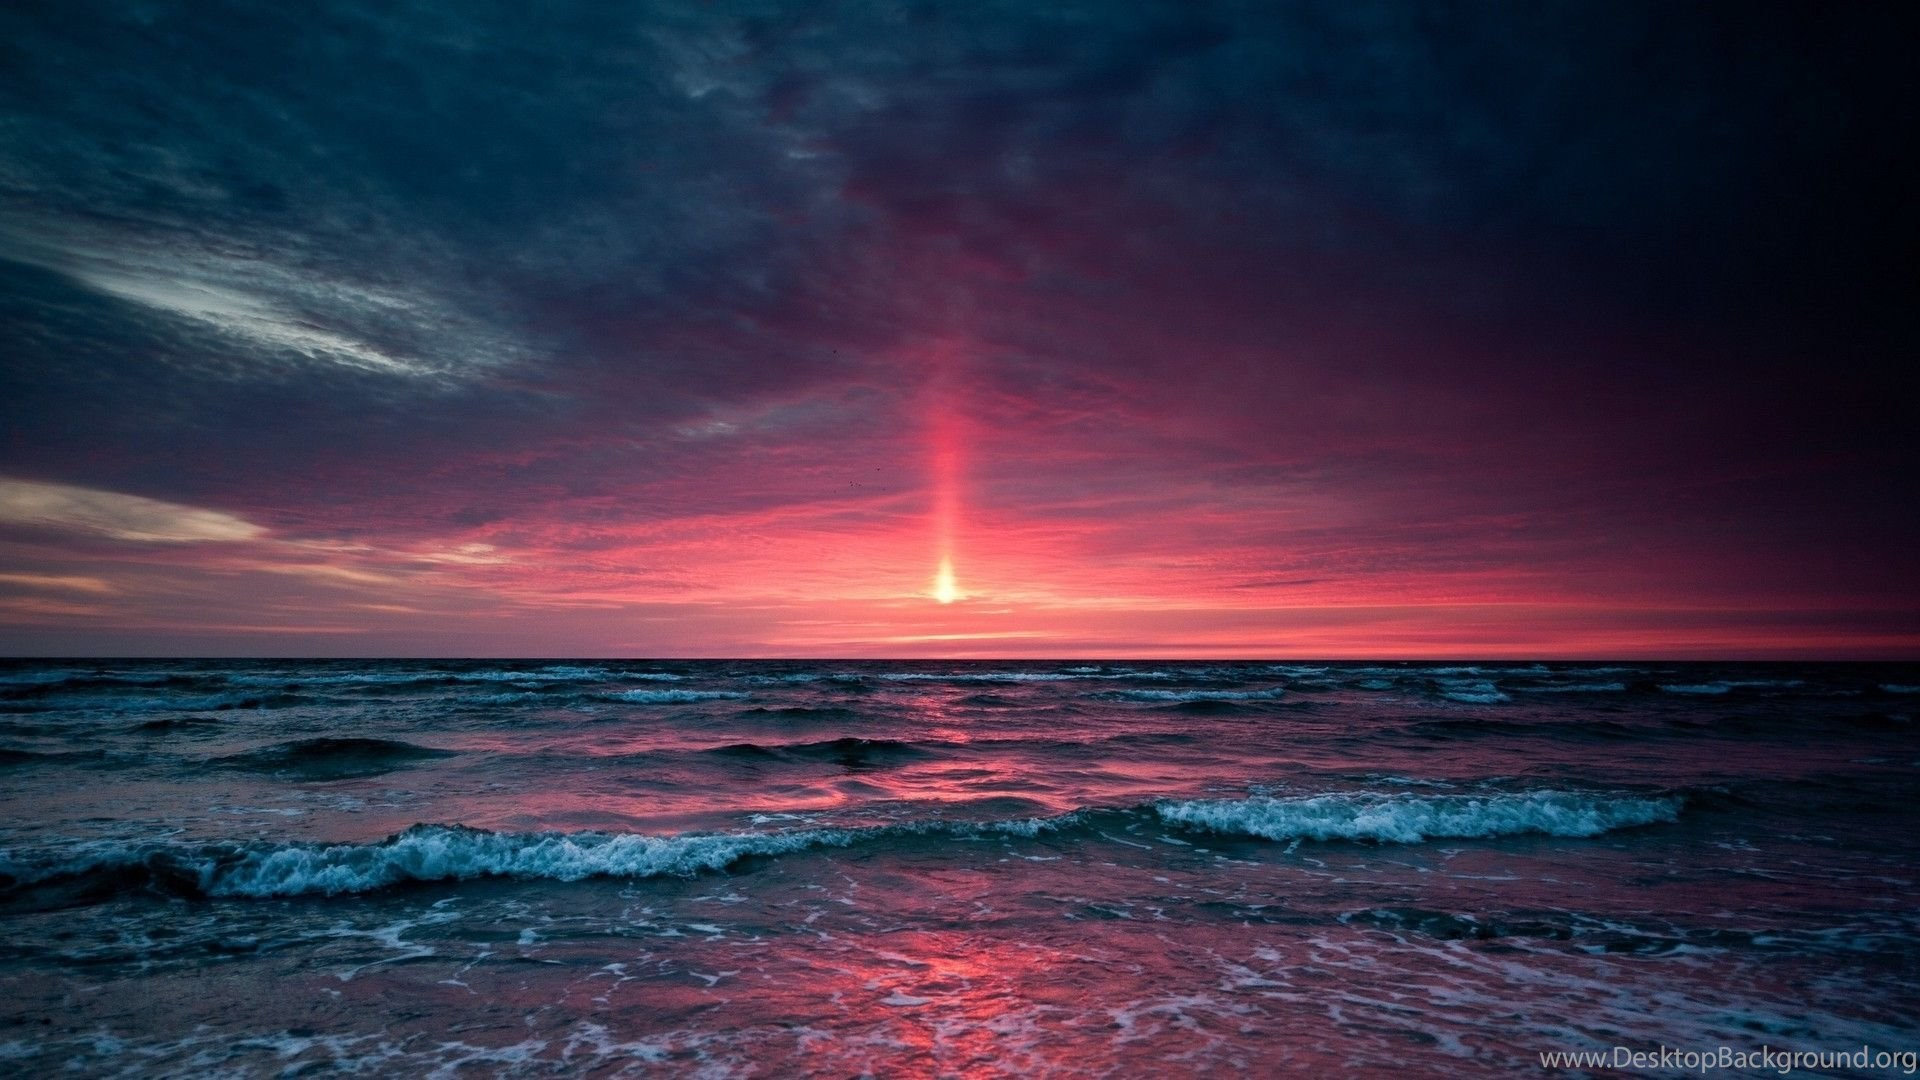 Ocean Sunset Hd Wallpaper Ocean Sunset Pictures New Wallpapers Desktop Background